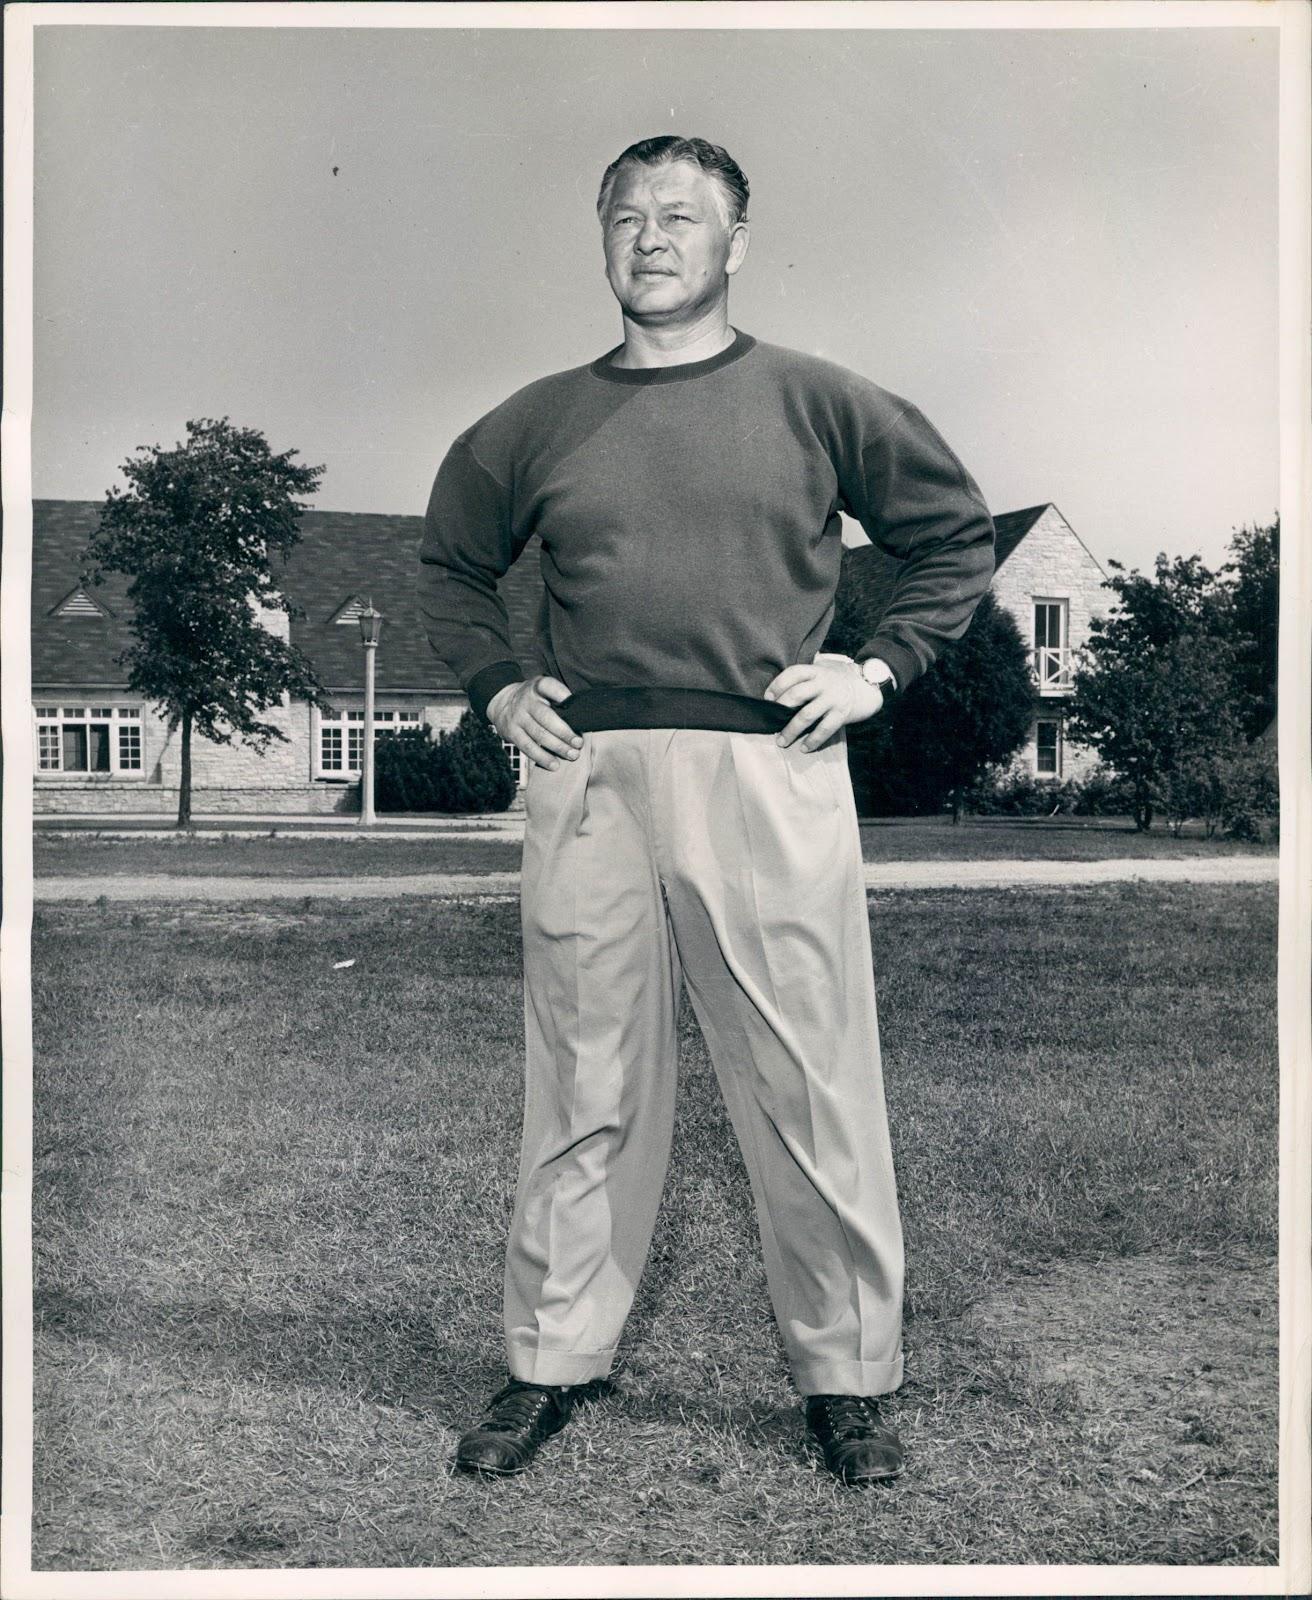 PACKERVILLE, U.S.A.: The Man. The Legend.